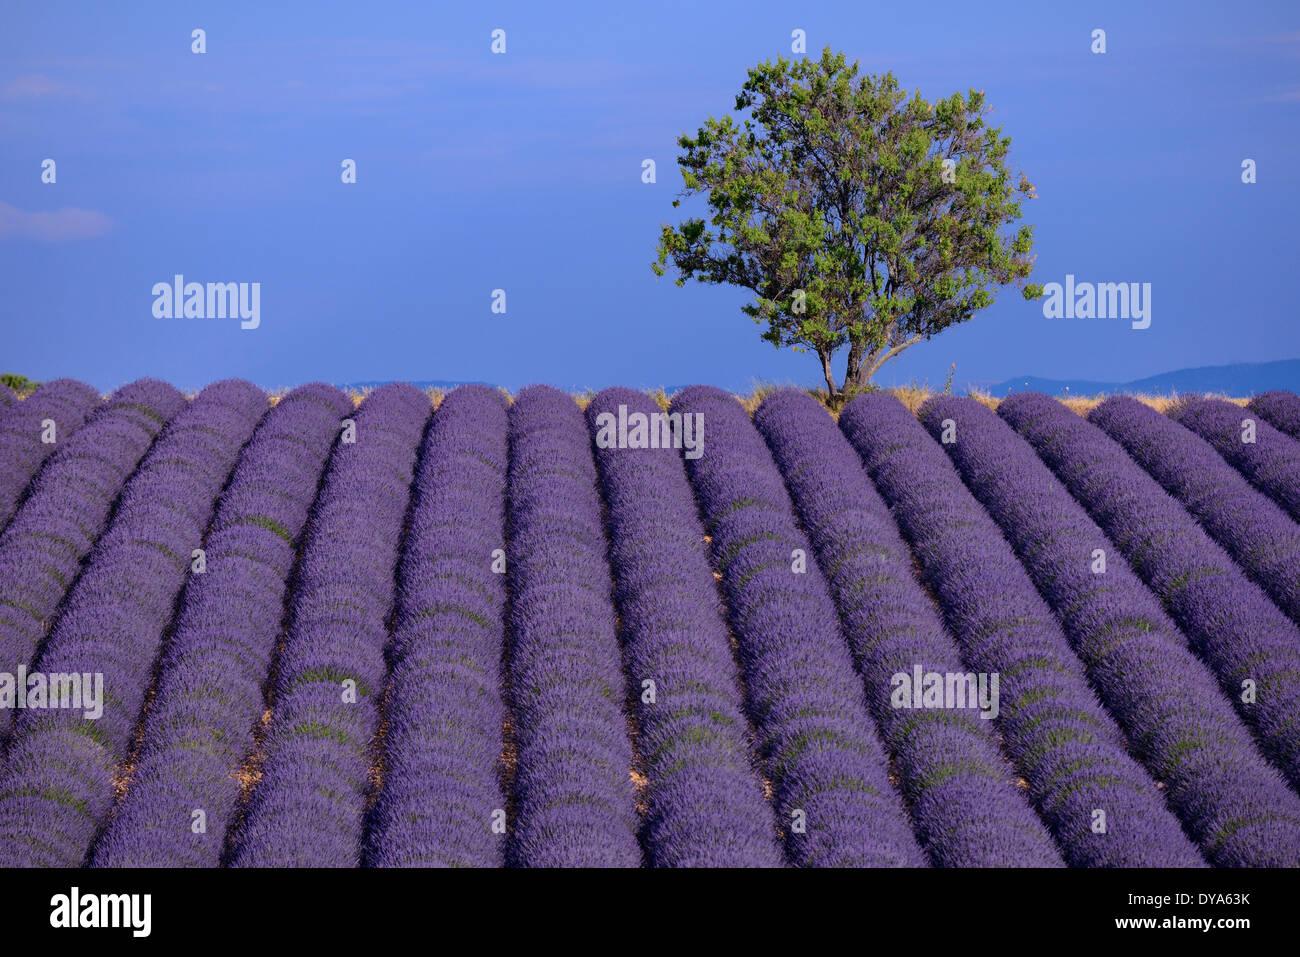 Europe France Provence Vaucluse Field Tree Lavender Bloom